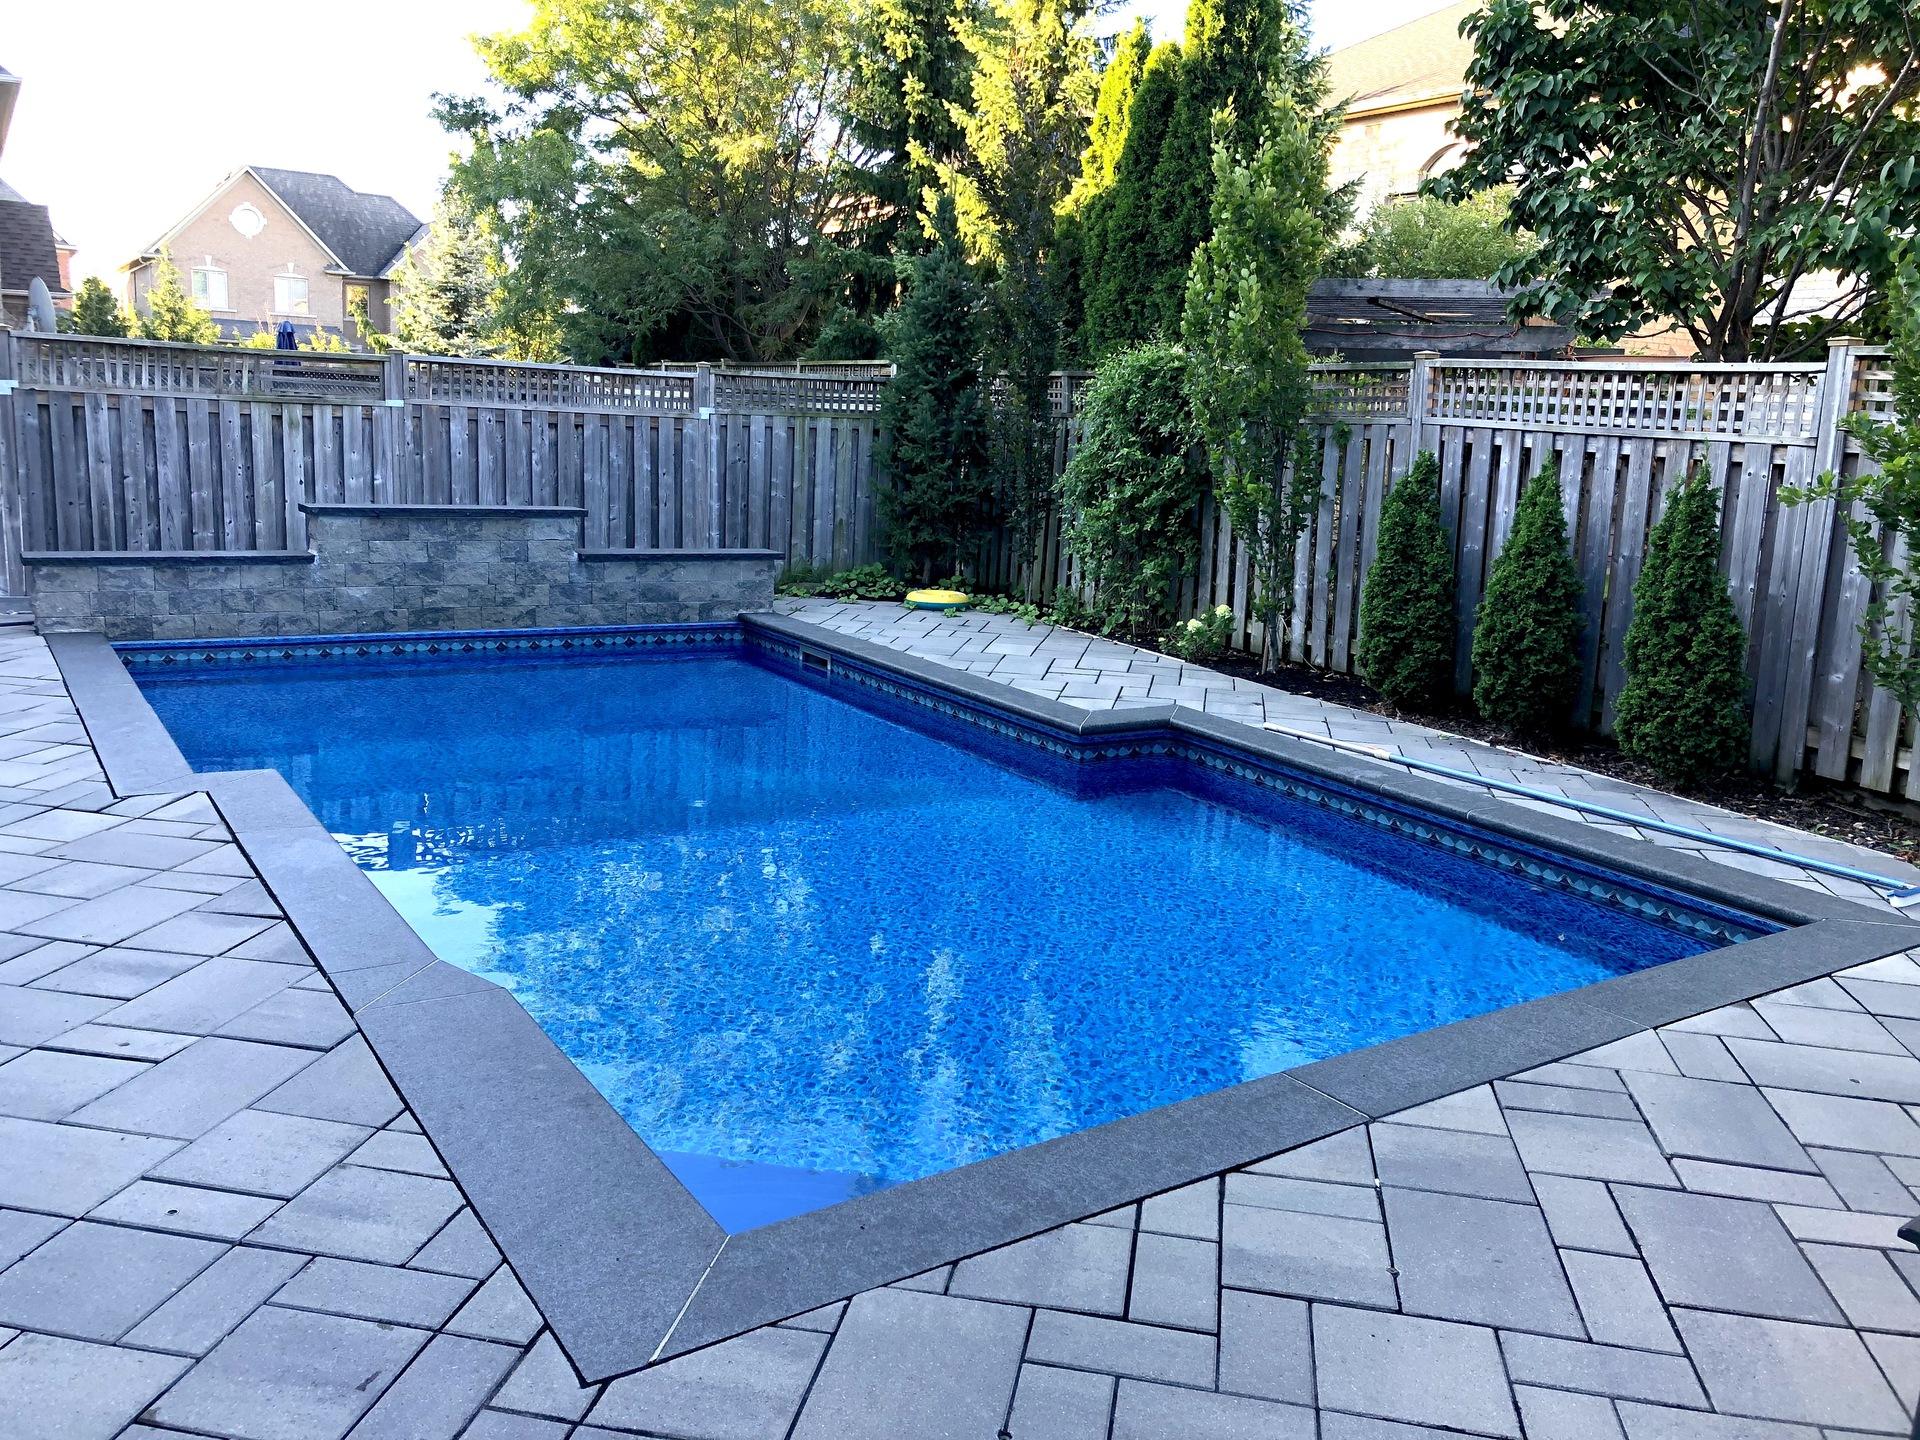 Summer Pool - 2473 Tesla Cres, Oakville - Elite3 & Team at 2473 Tesla Crescent, Iroquois Ridge North, Oakville